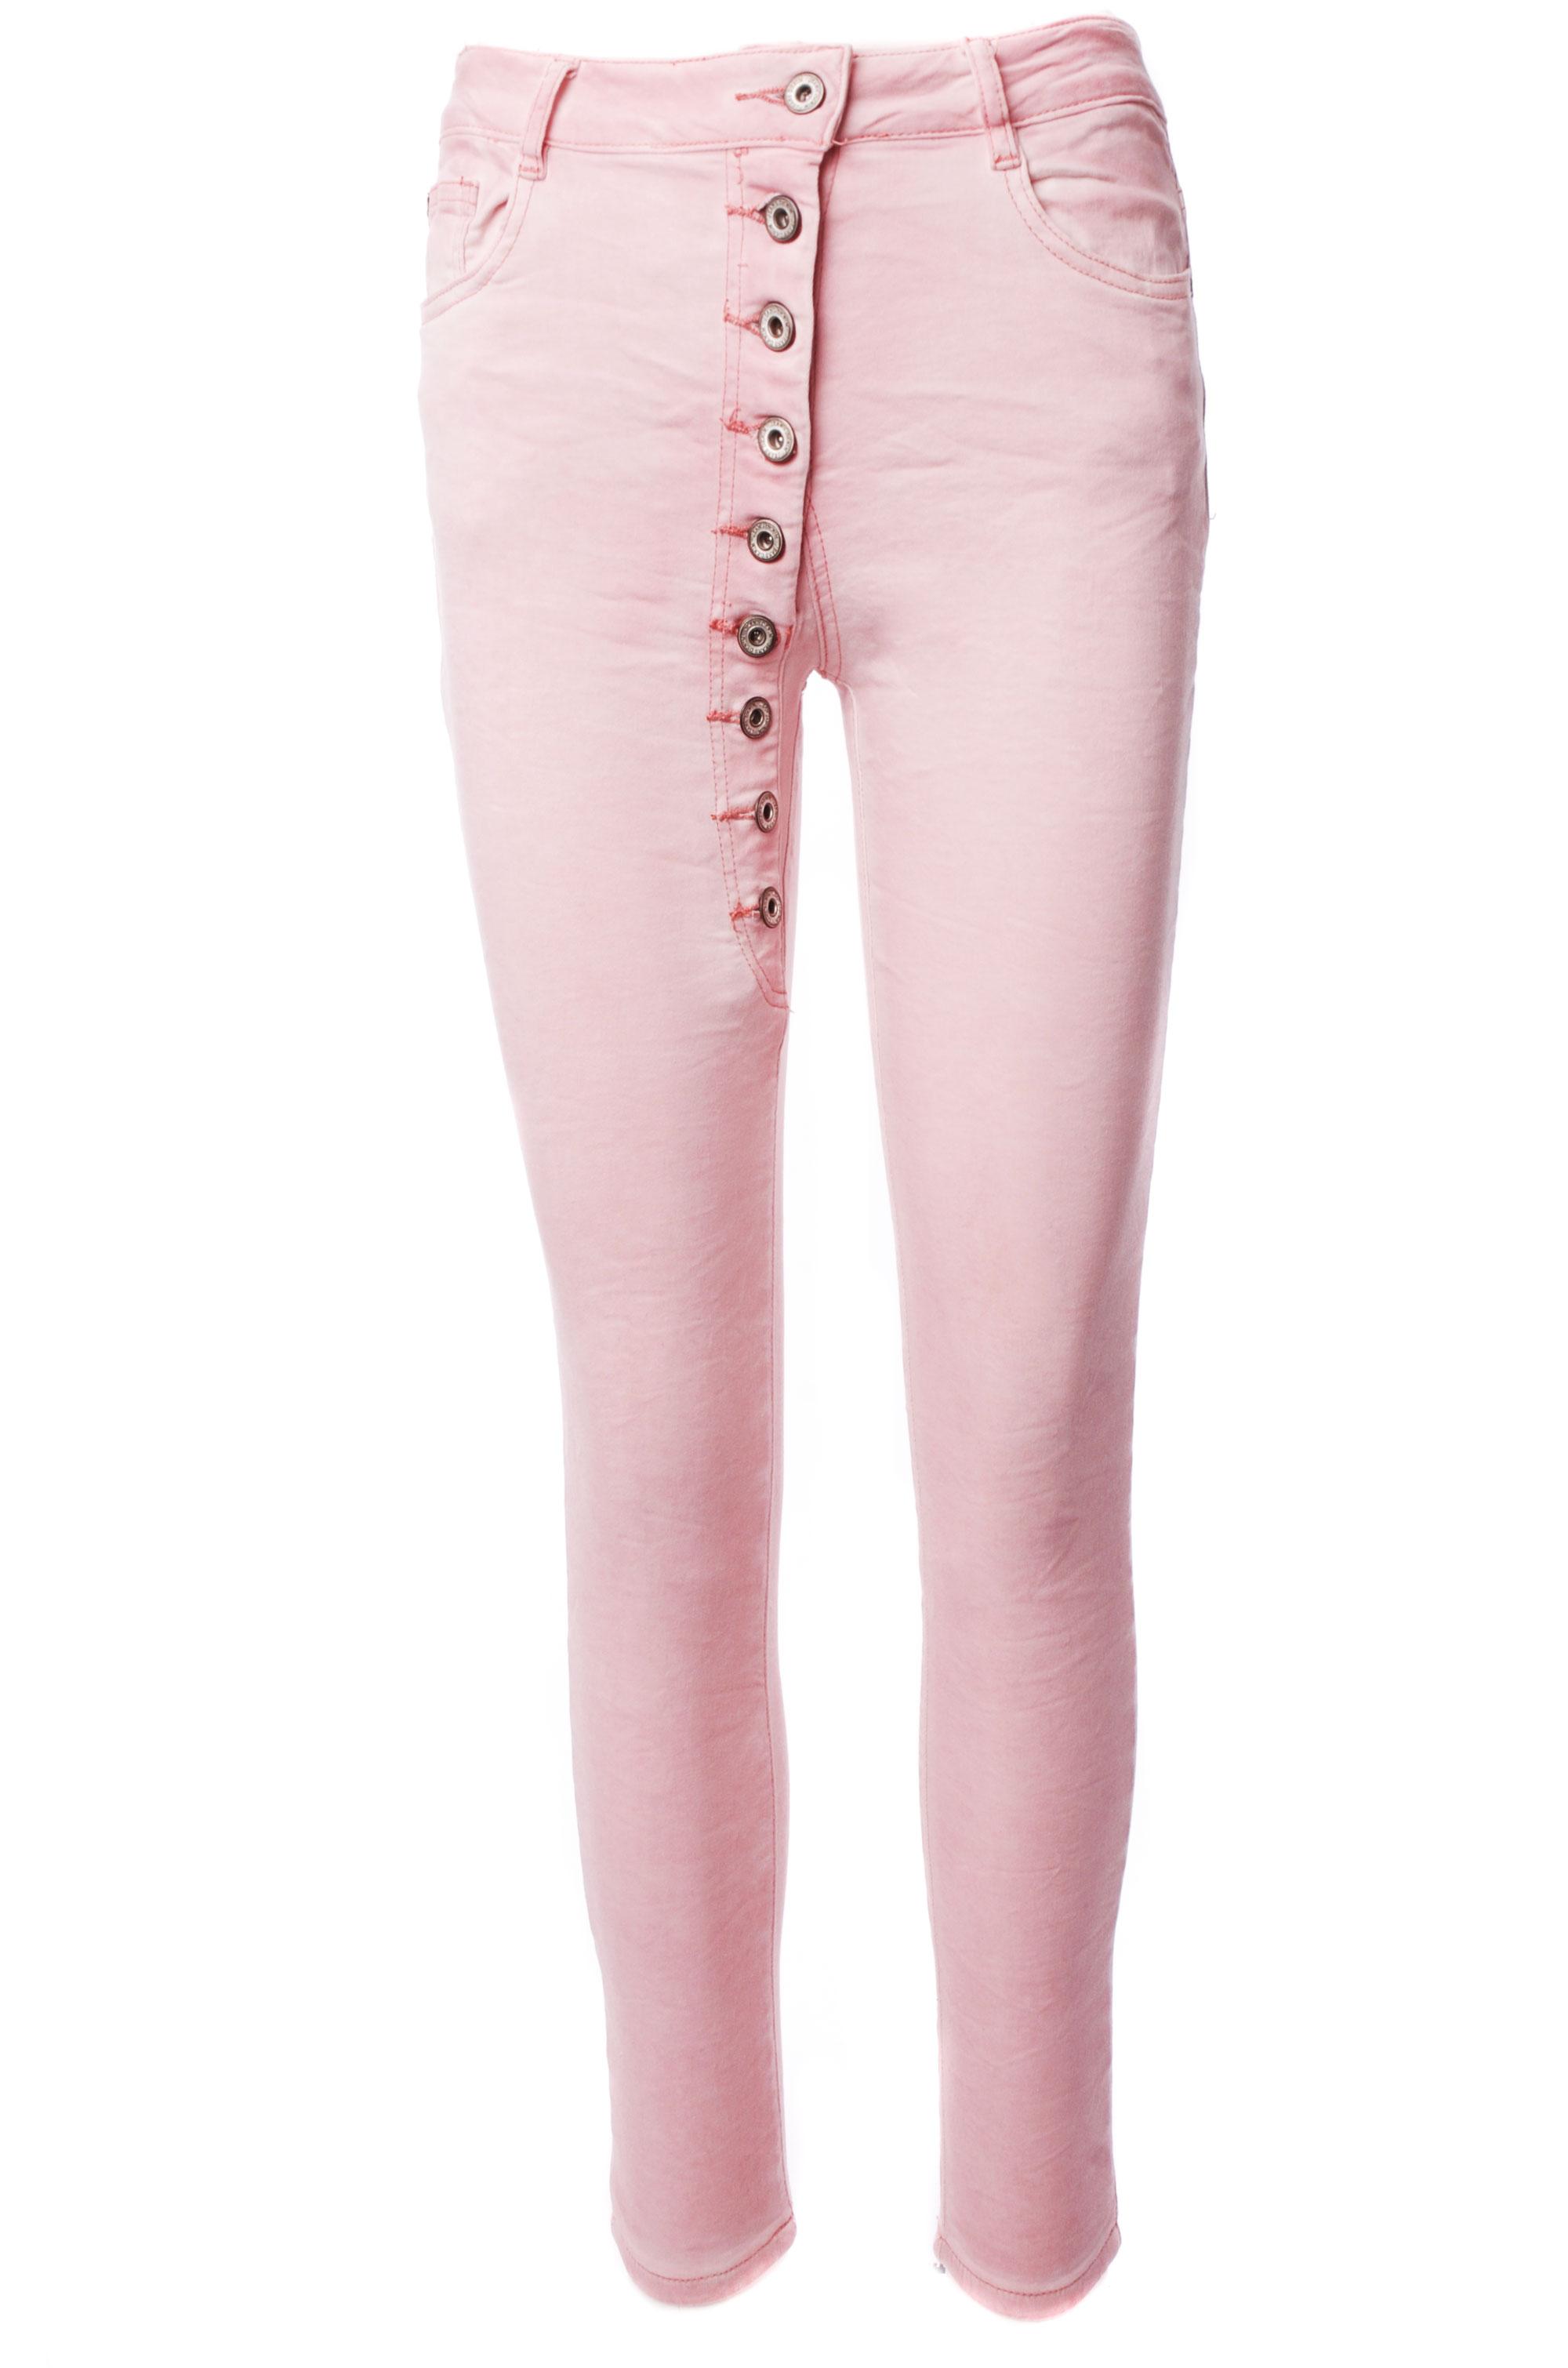 Spodnie - 42-9001 ROSA - Unisono